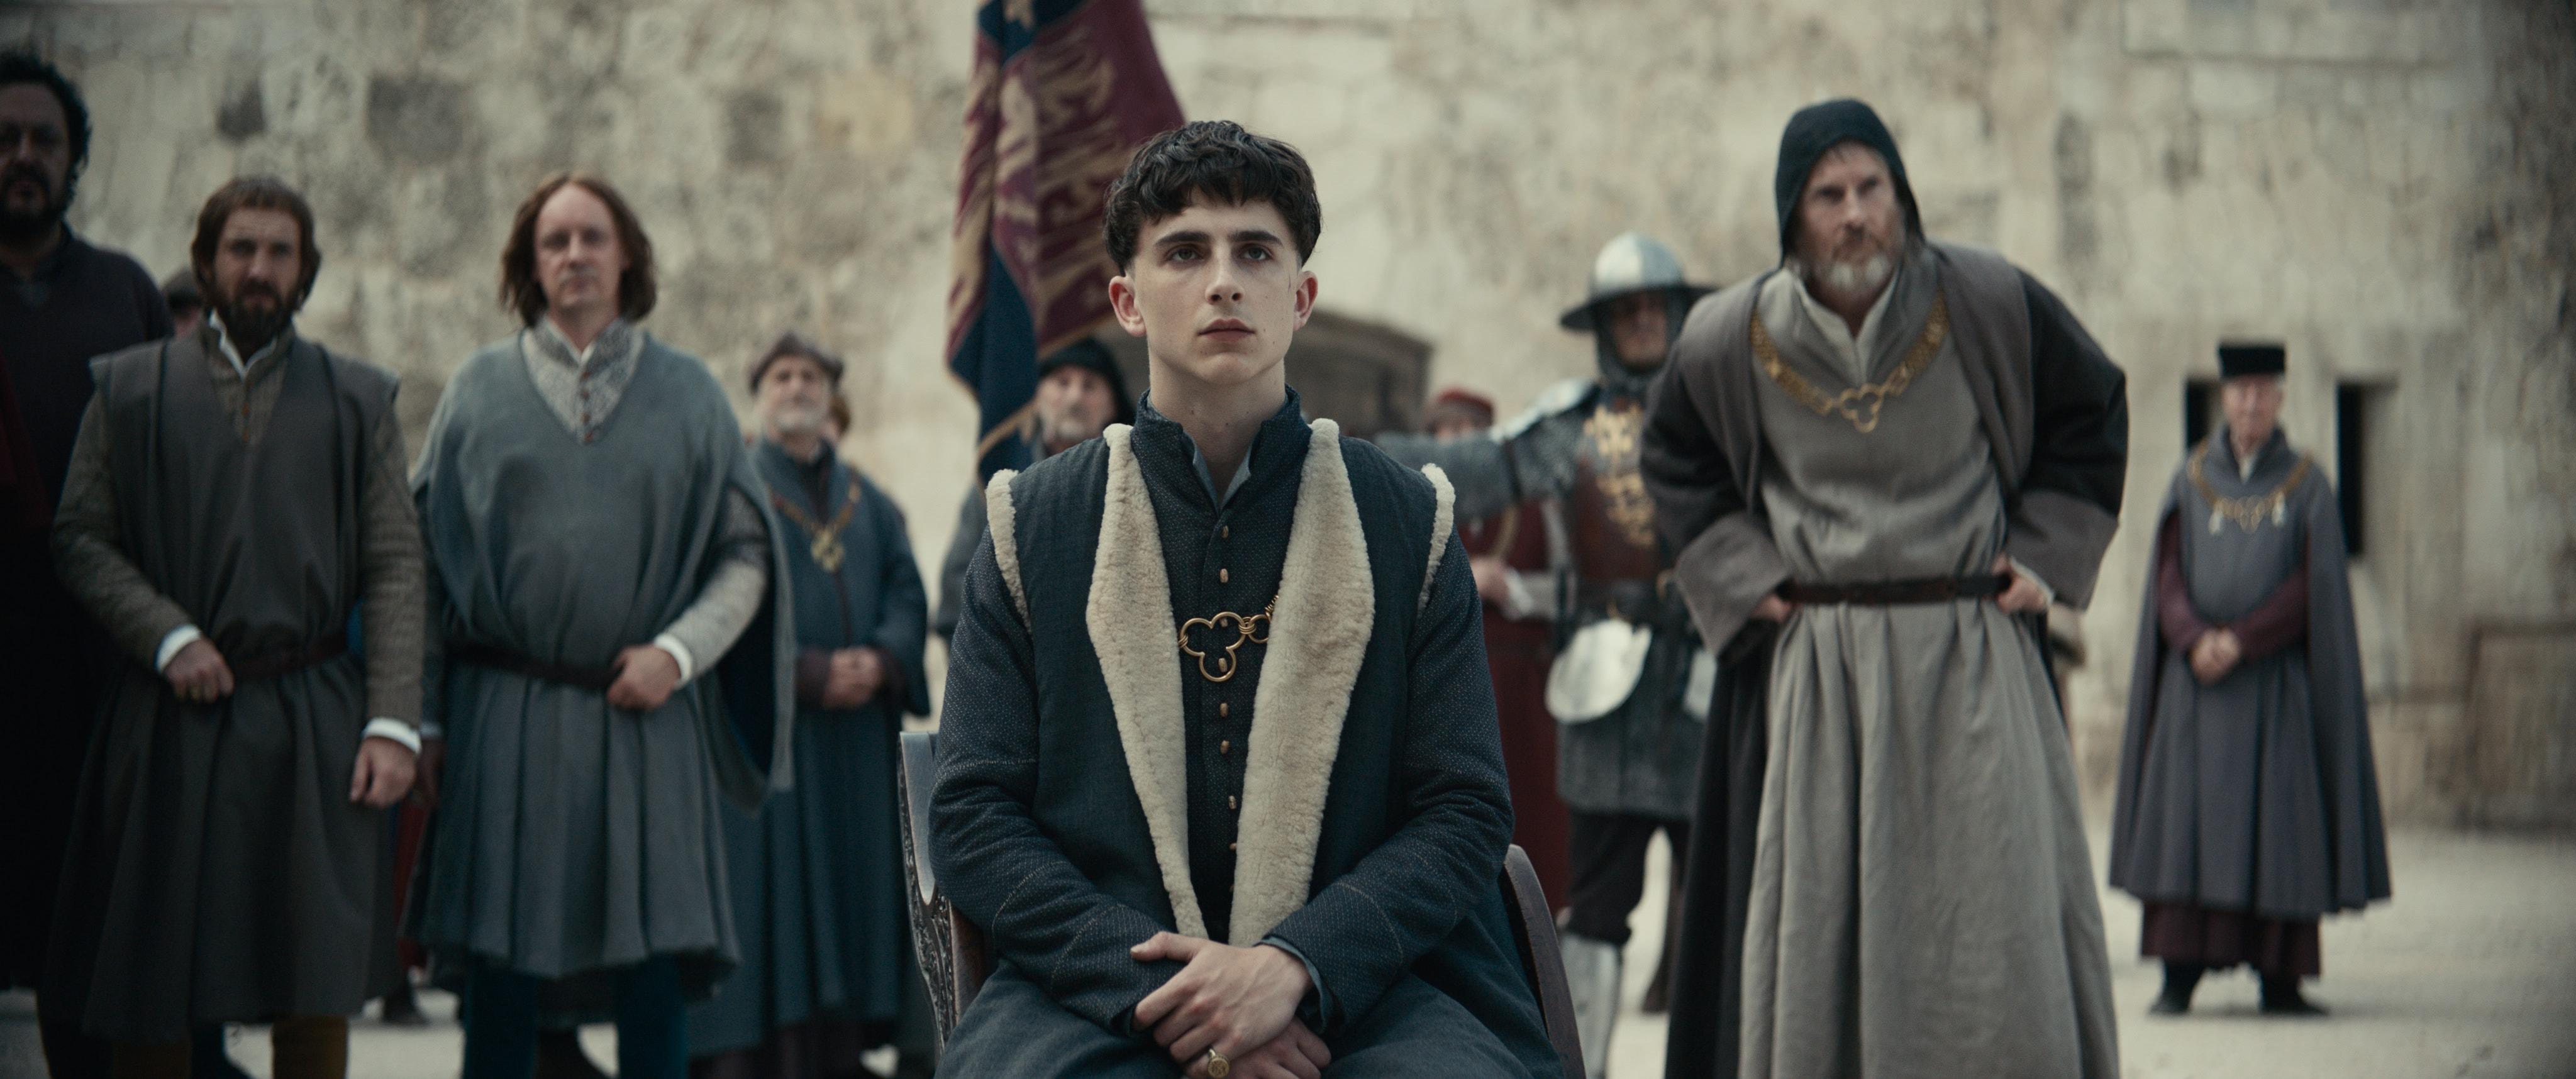 The King: Steven Elder, Timothée Chalamet, Sean Harris